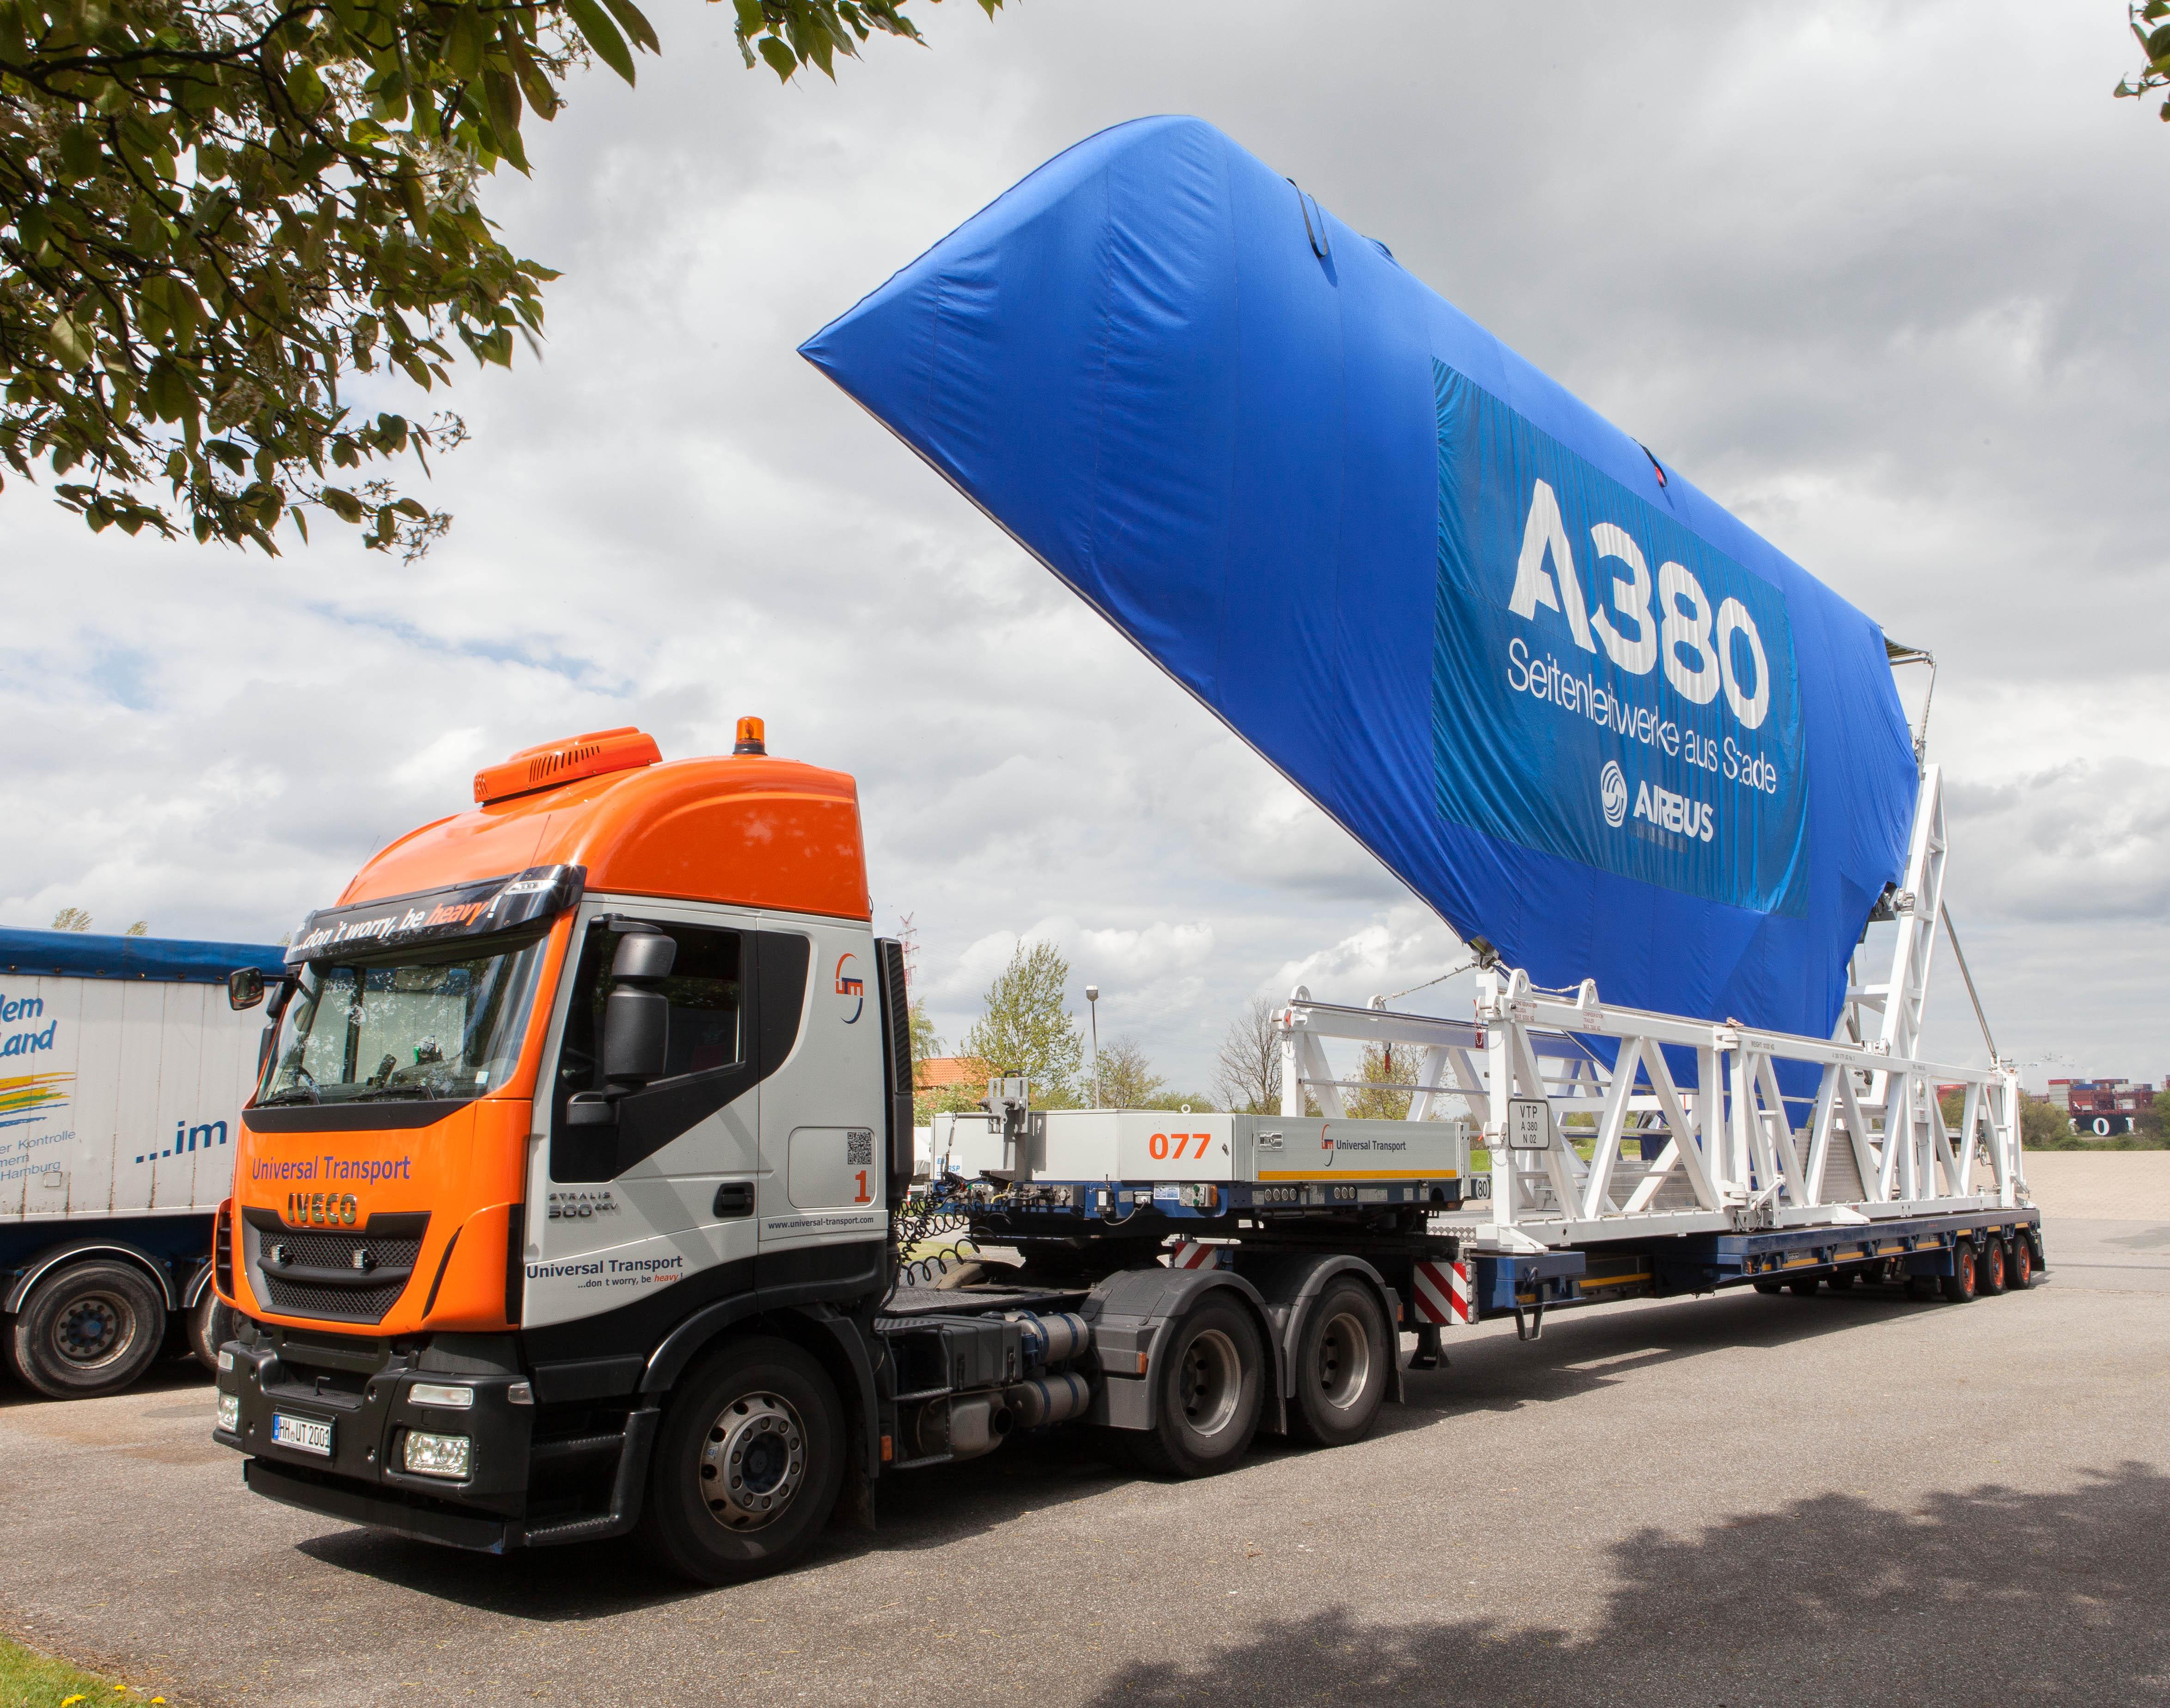 Universal Transport Aero